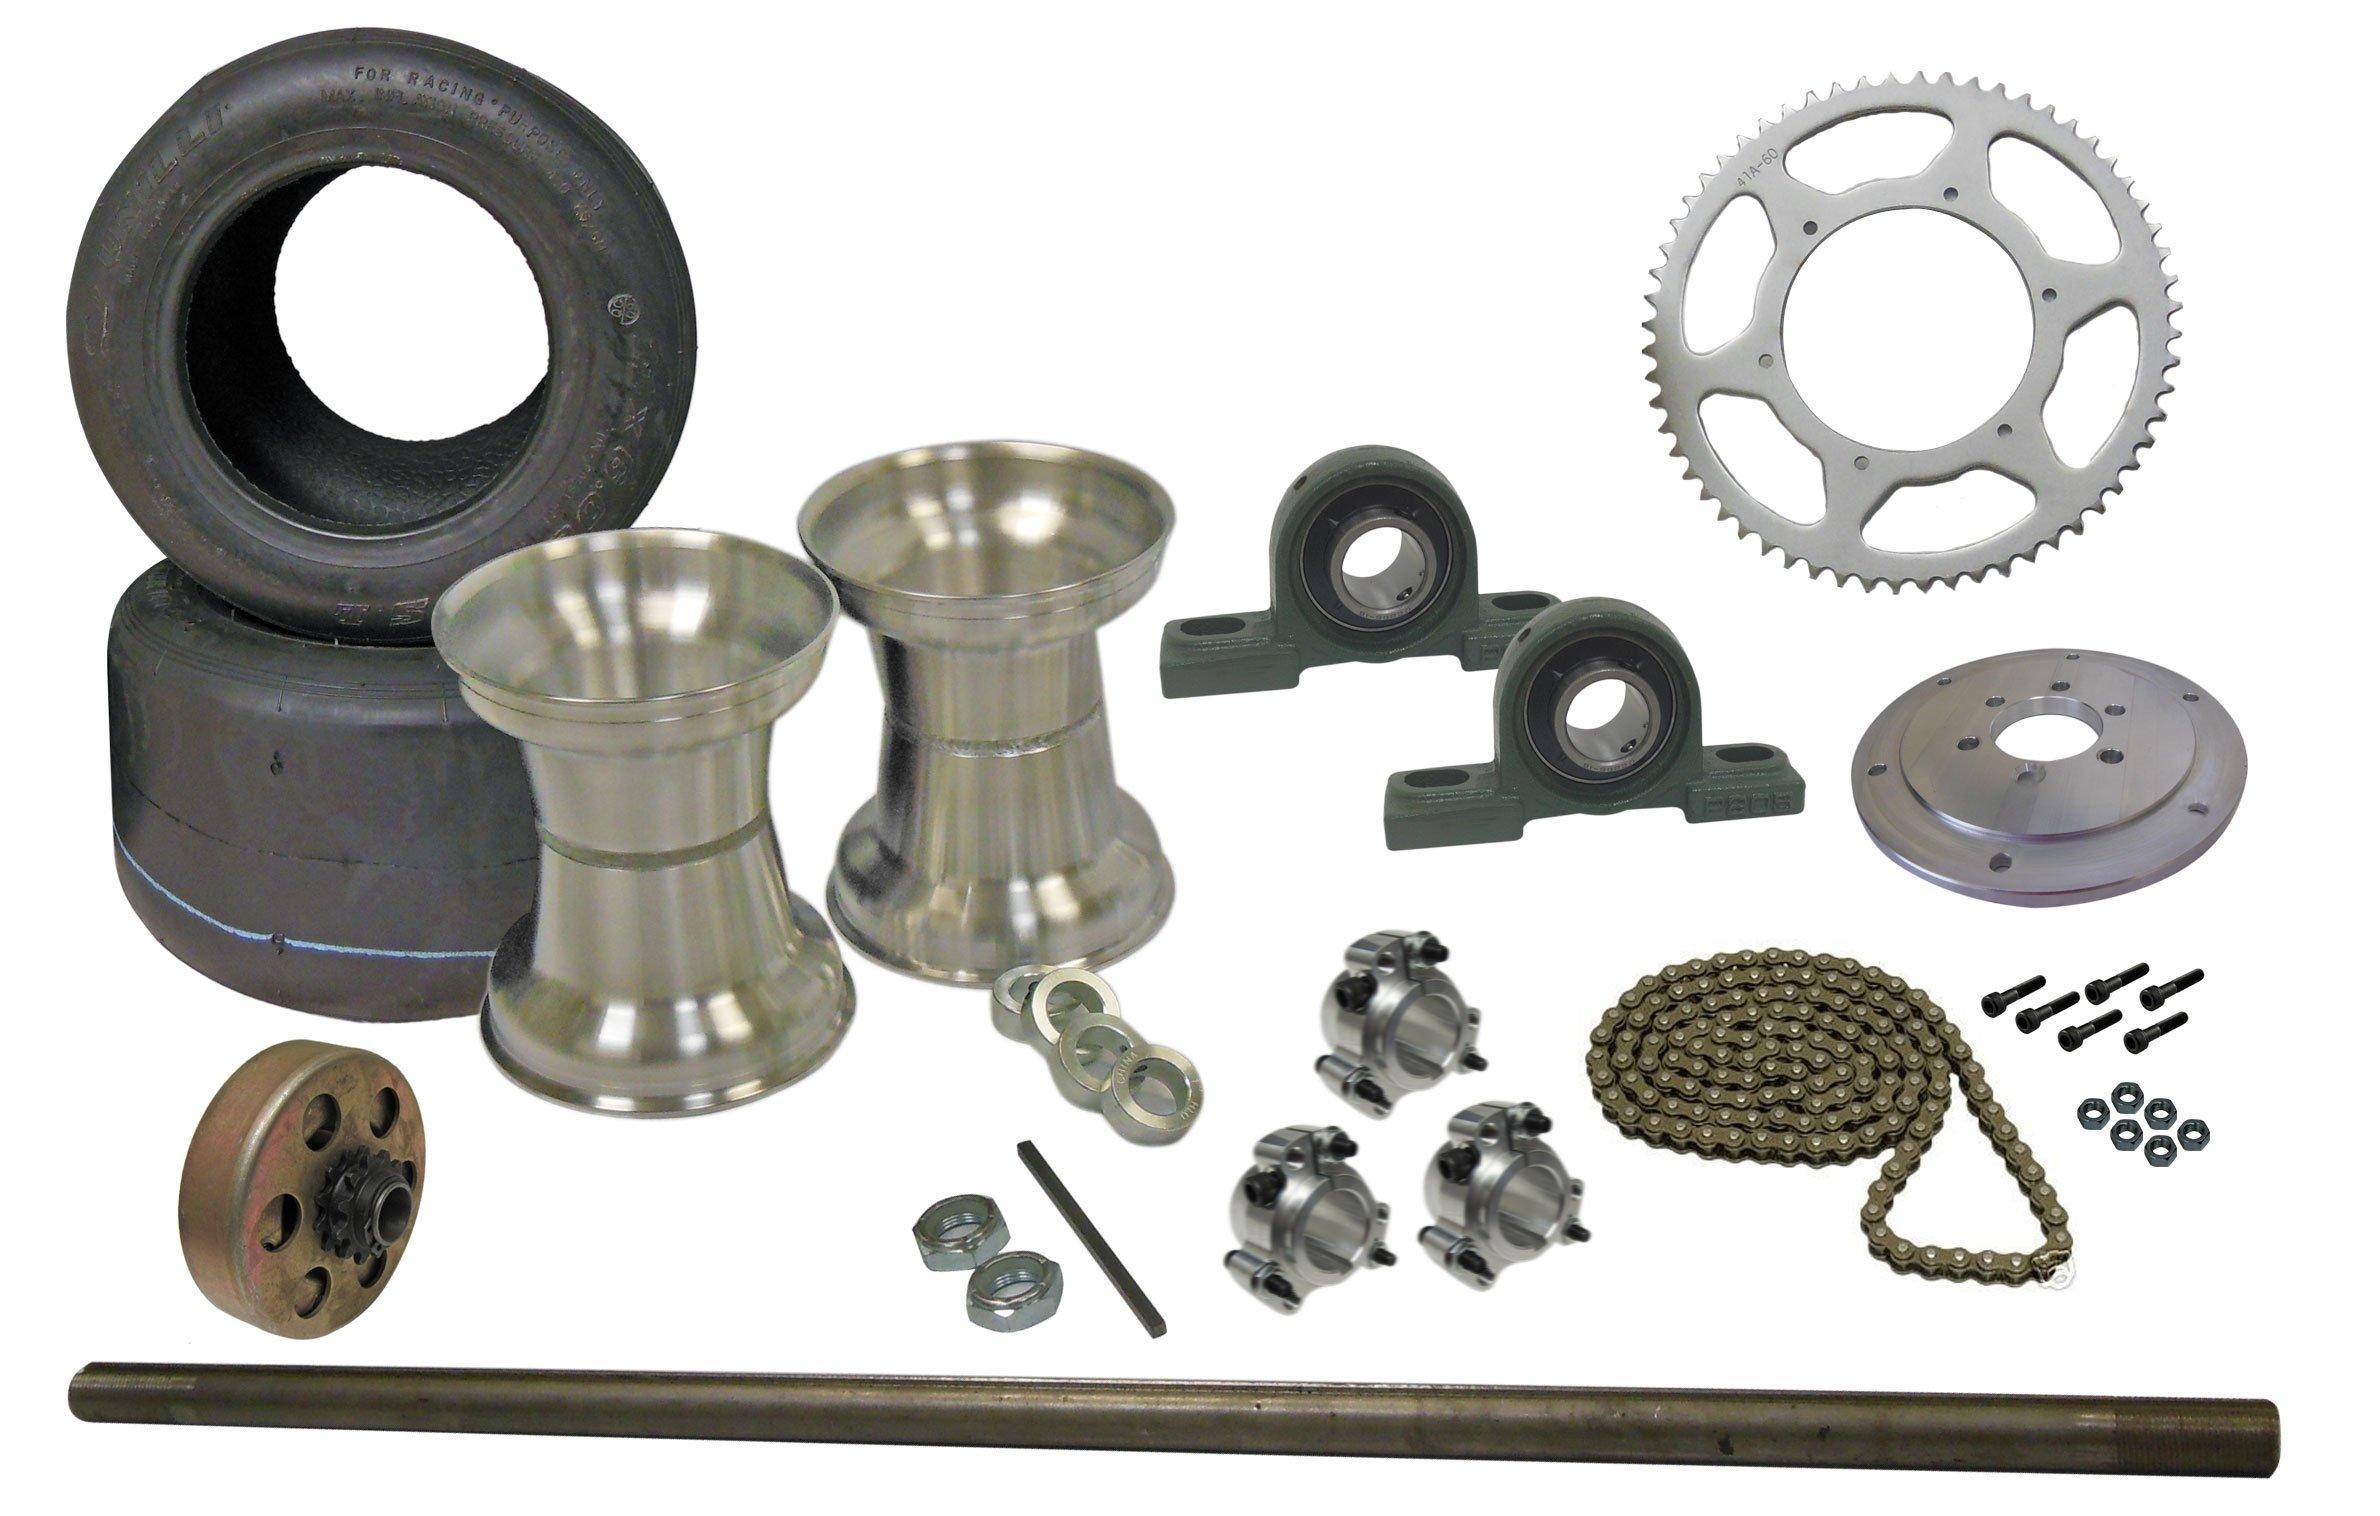 BMI Karts Drift Trike Kit Tires, Rims, Clutch, 40 Chain w/Pillow Block Bearings 40'' Axle